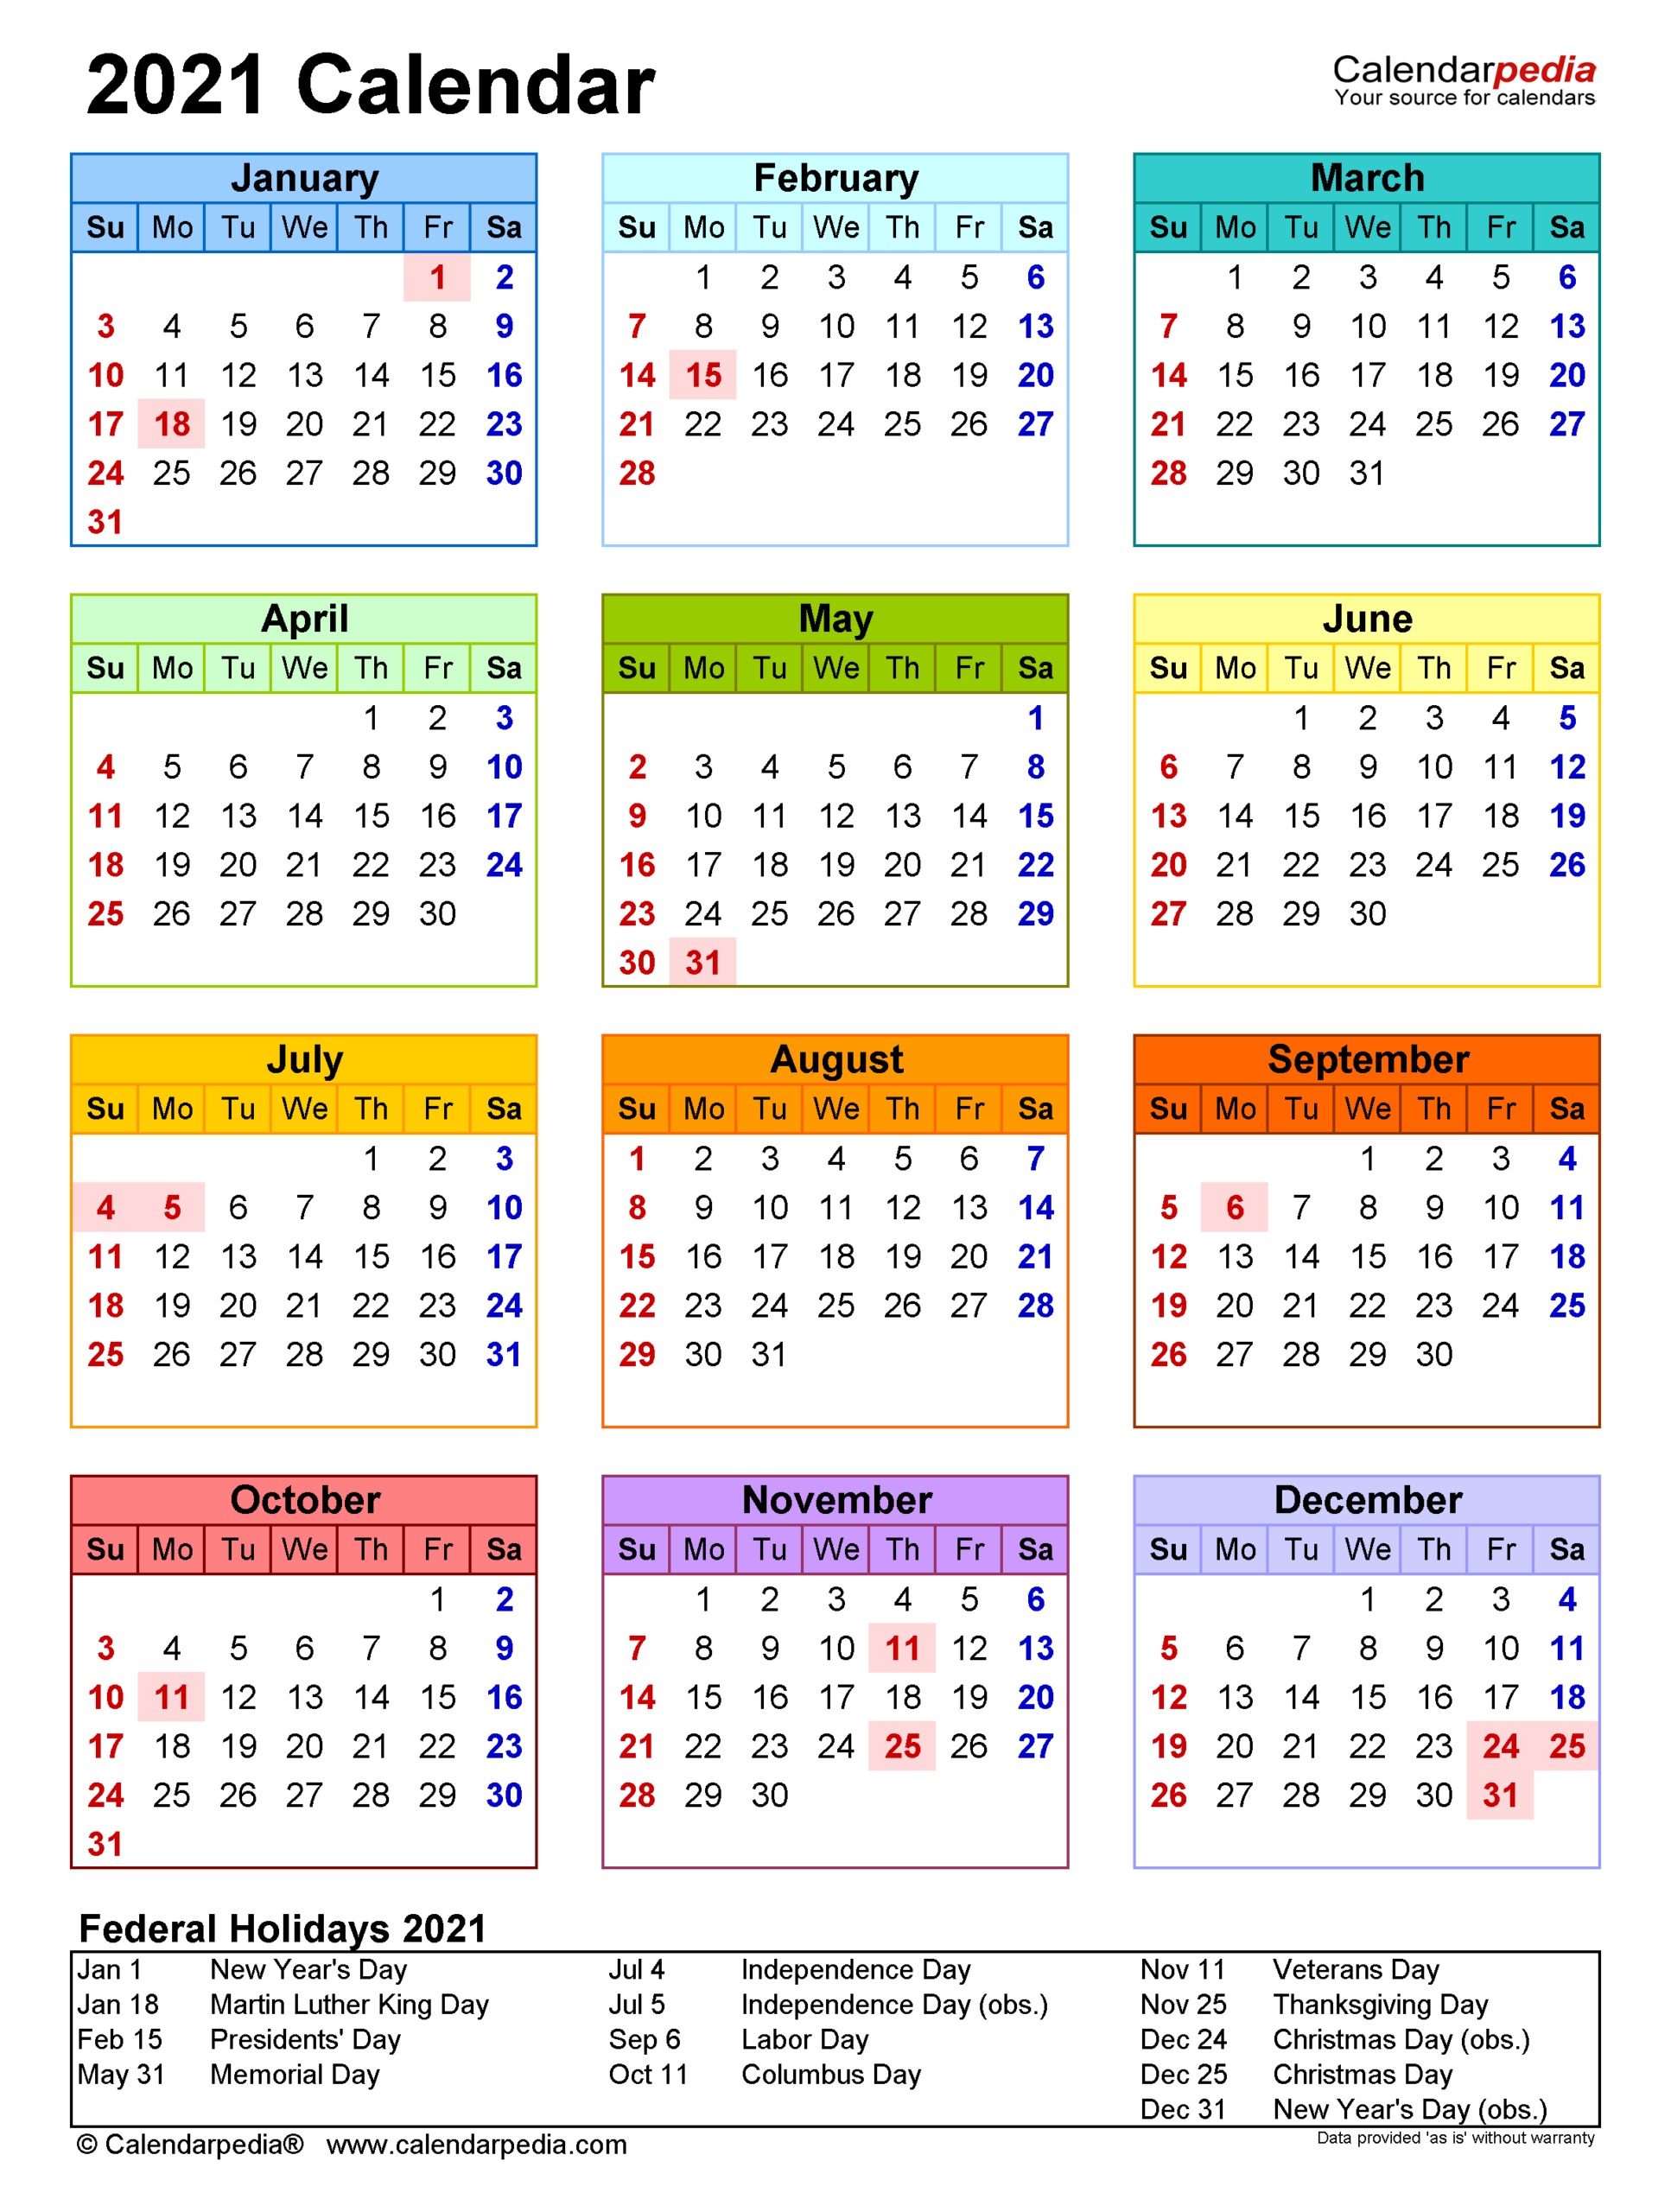 2021 Calendar Holidays And Observances | Printable-Printable Calendar 2021 With Major Holidays